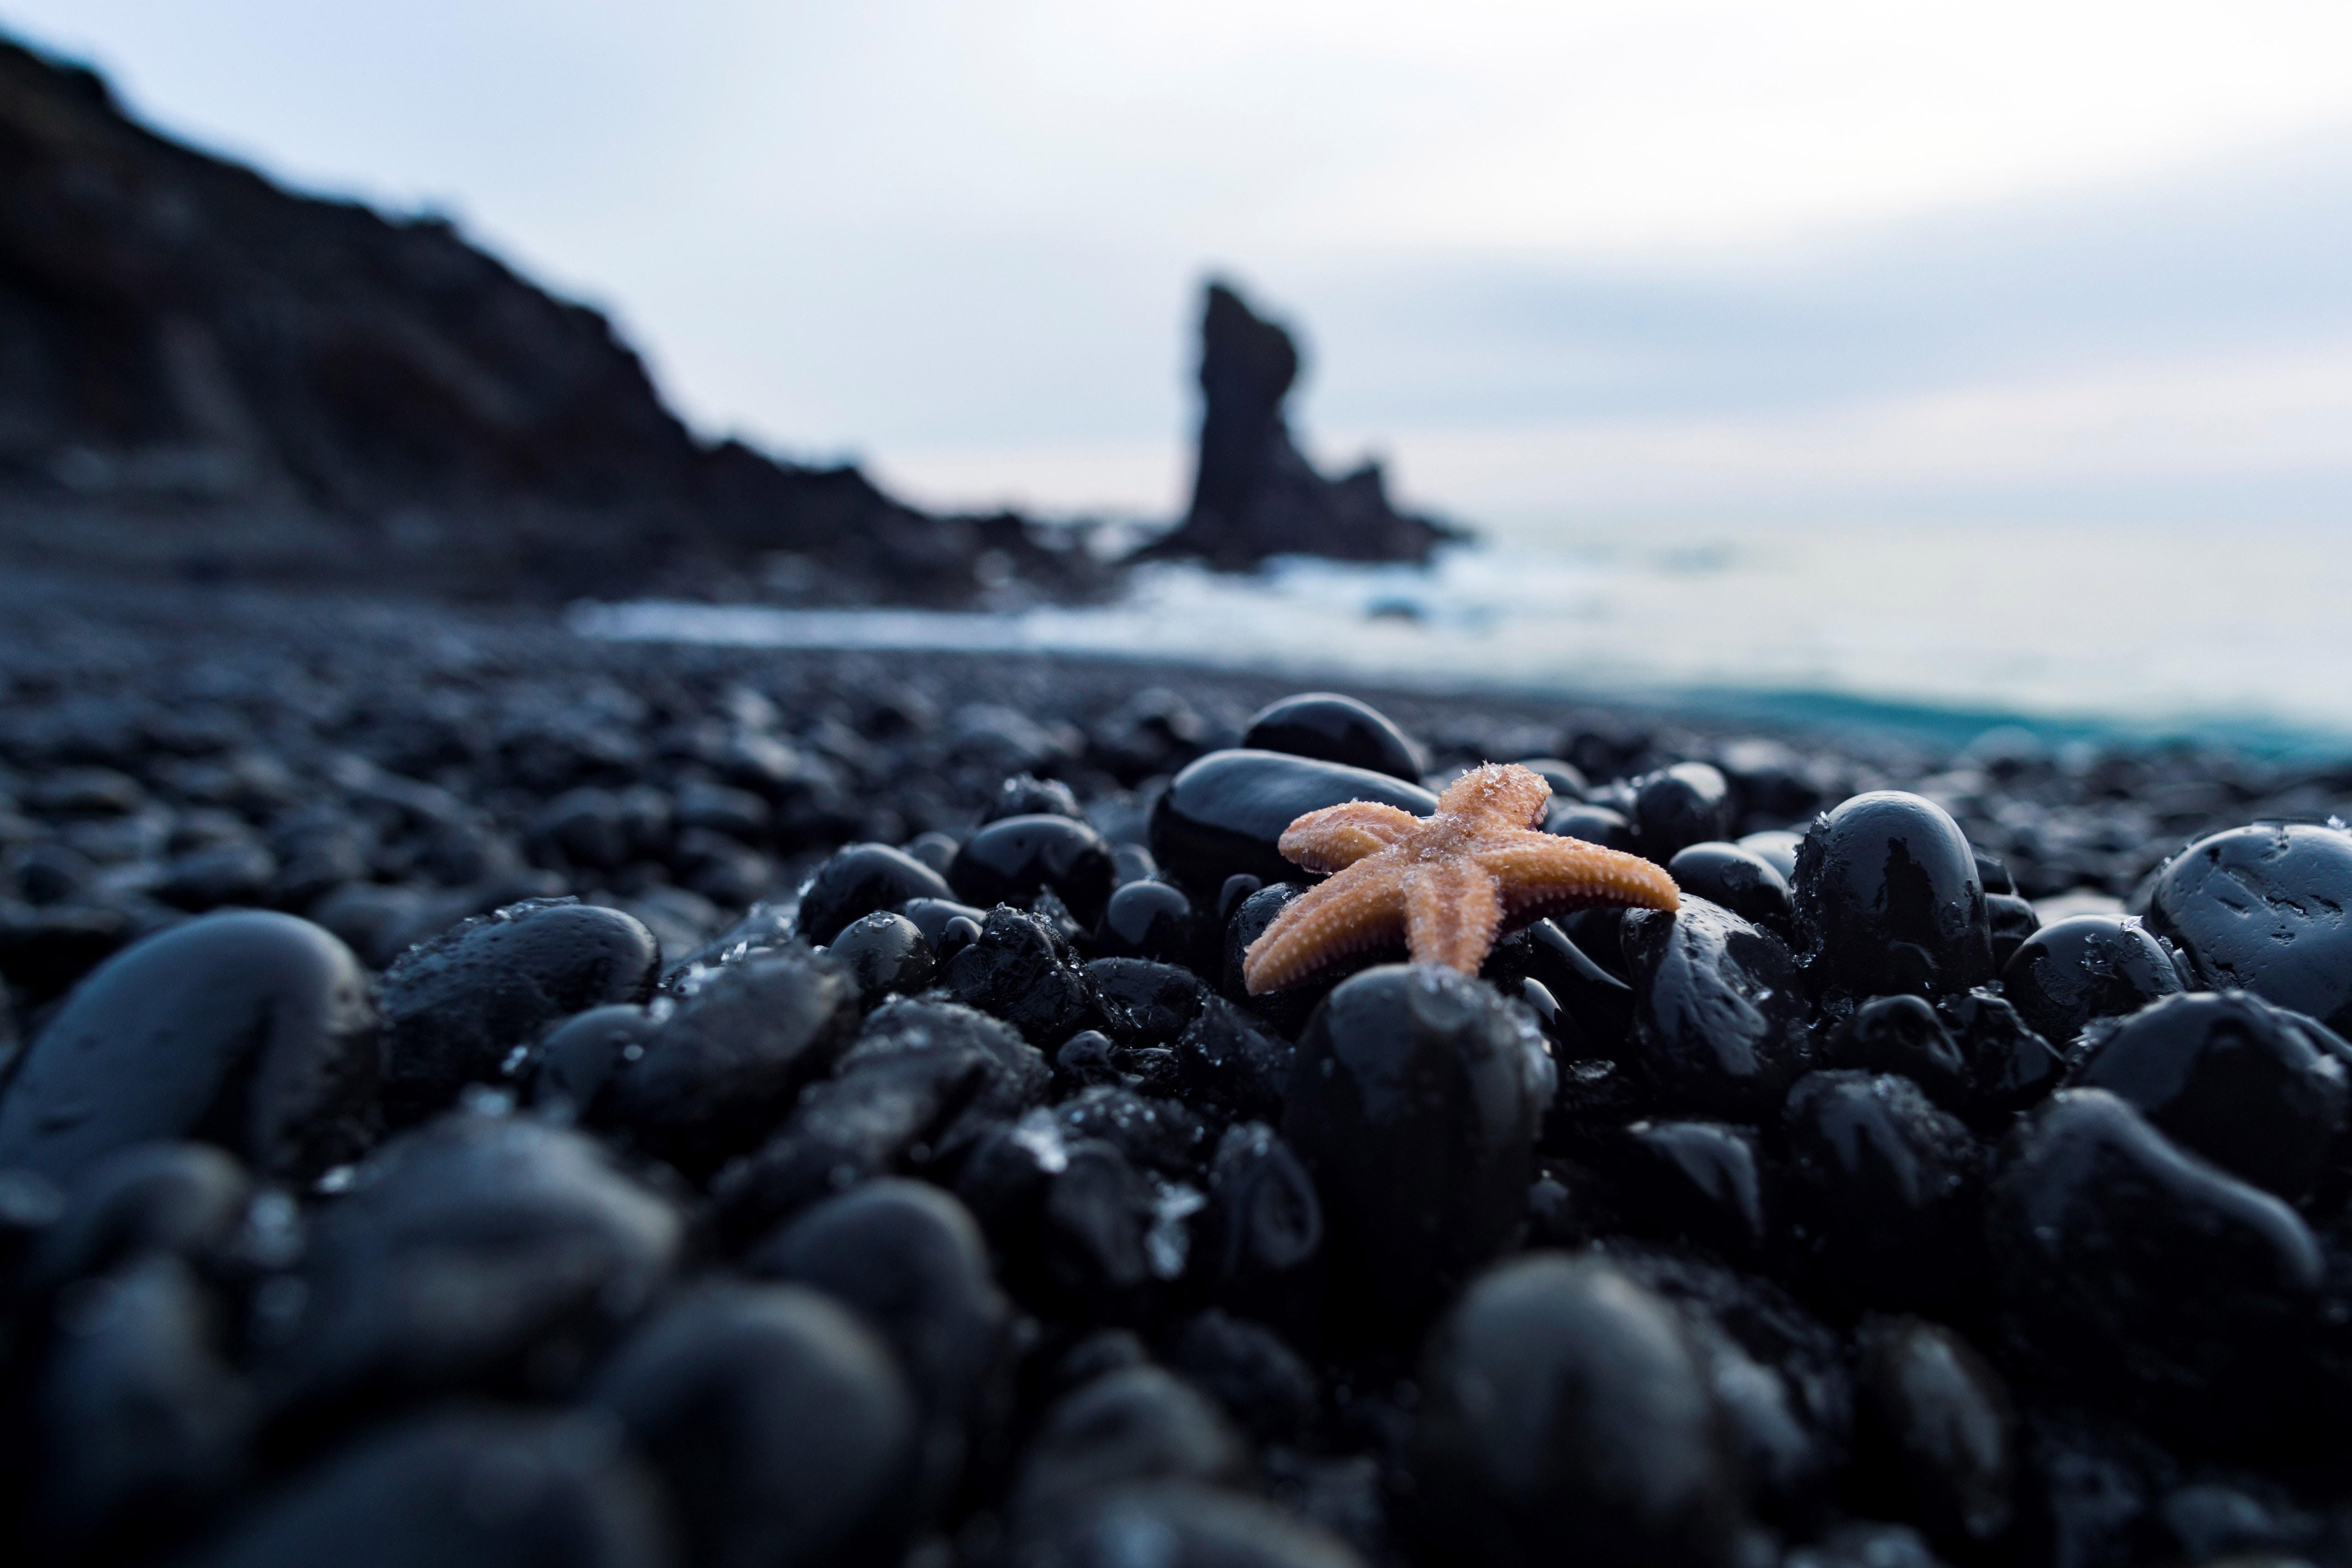 120586 download wallpaper Macro, Starfish, Pebble, Stones, Nautical, Maritime screensavers and pictures for free